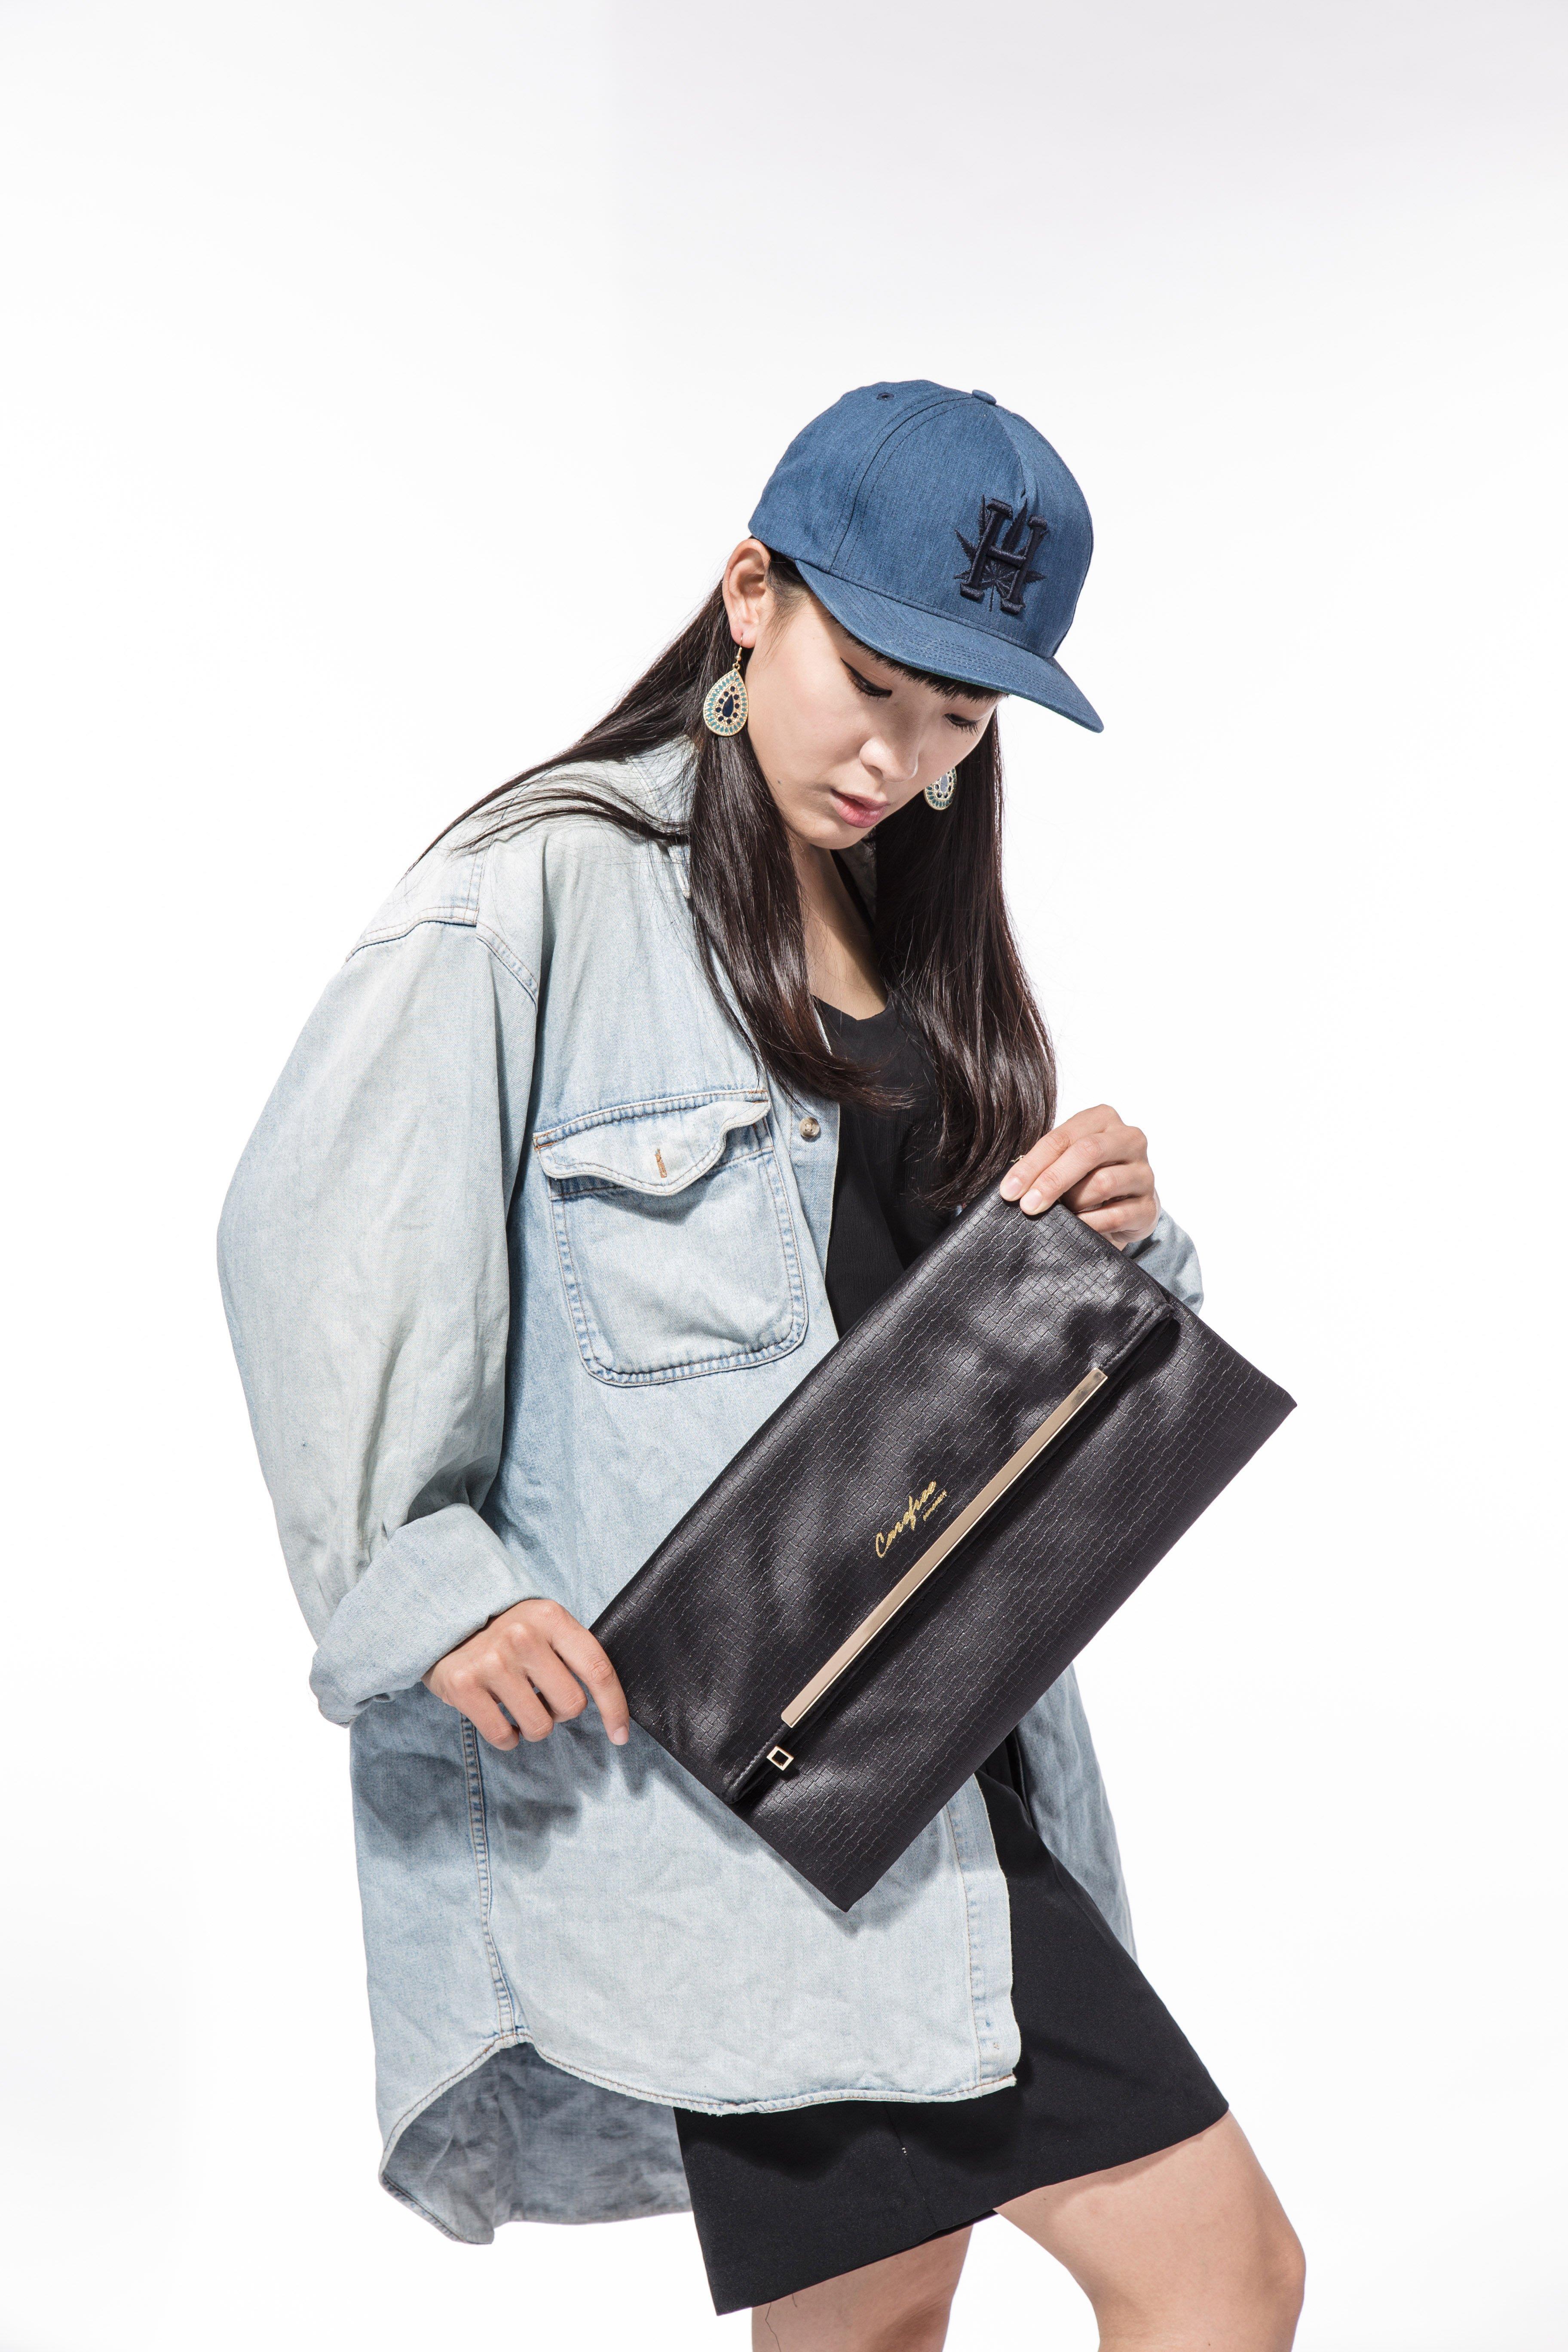 Carefree 防水信封包 PU黑 側背包 肩背包 手拿包 手提包 鏈帶包 晚宴包